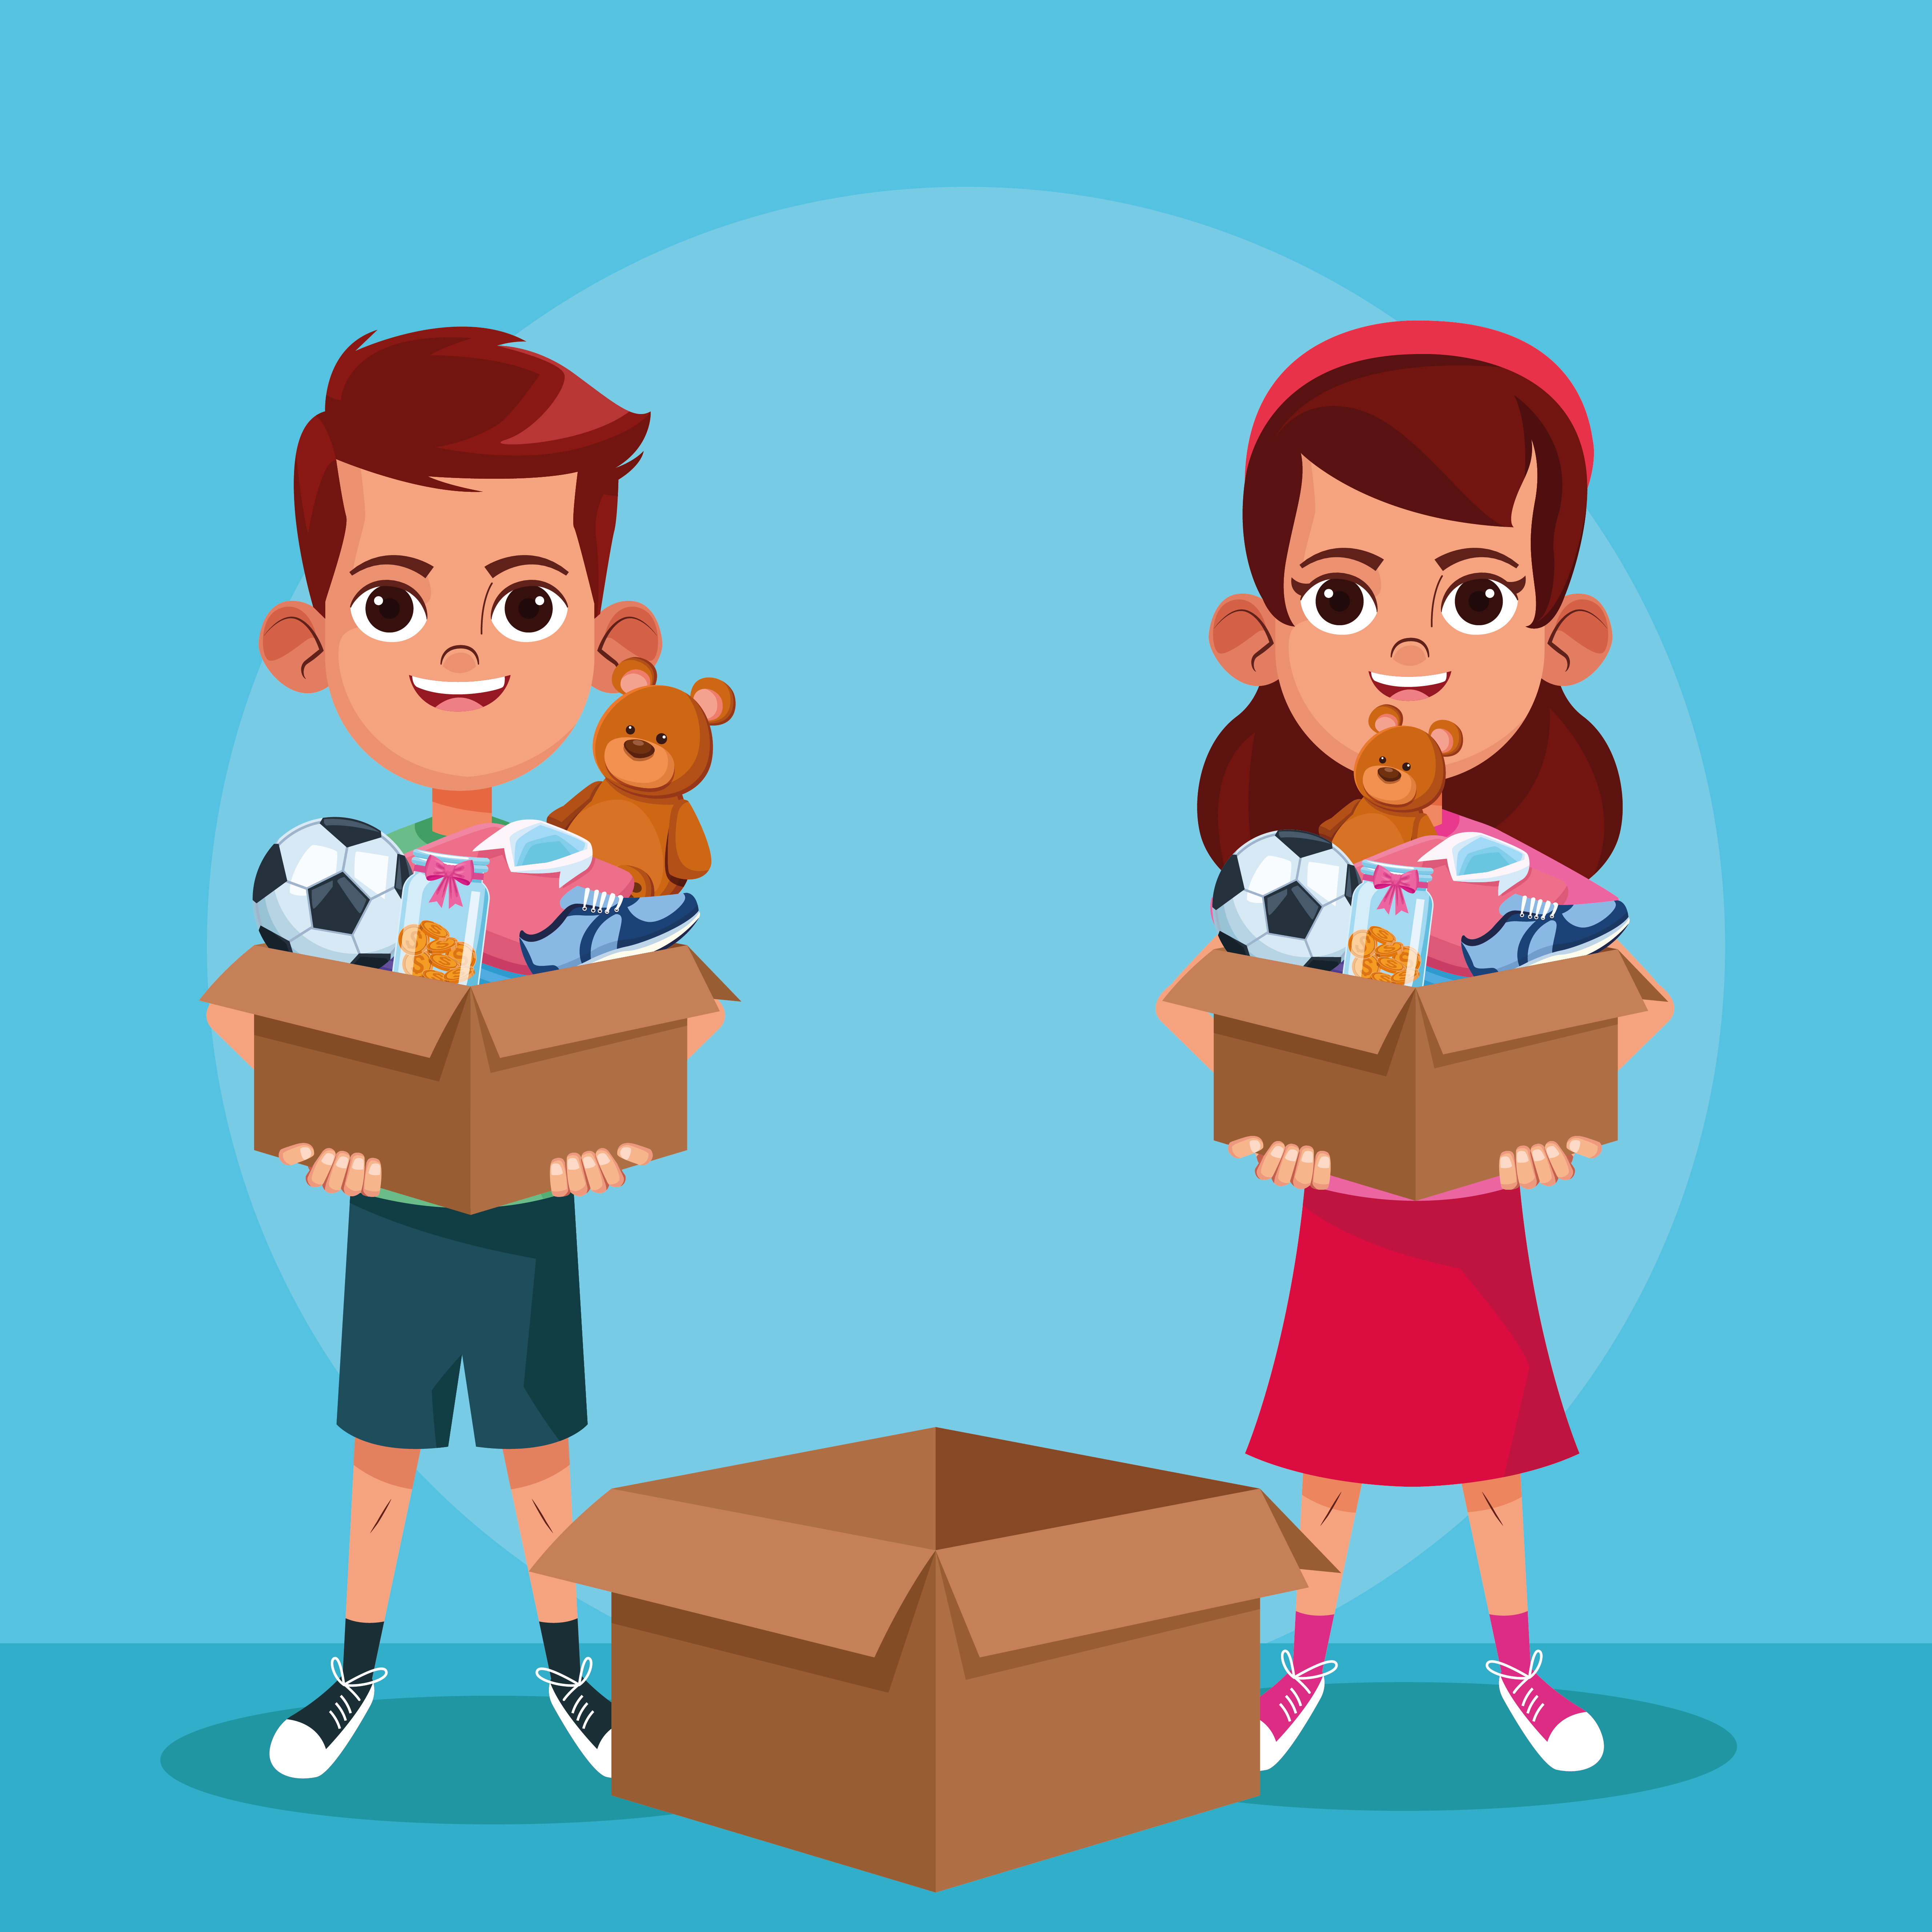 Kids Donation And Charity Cartoon 652232